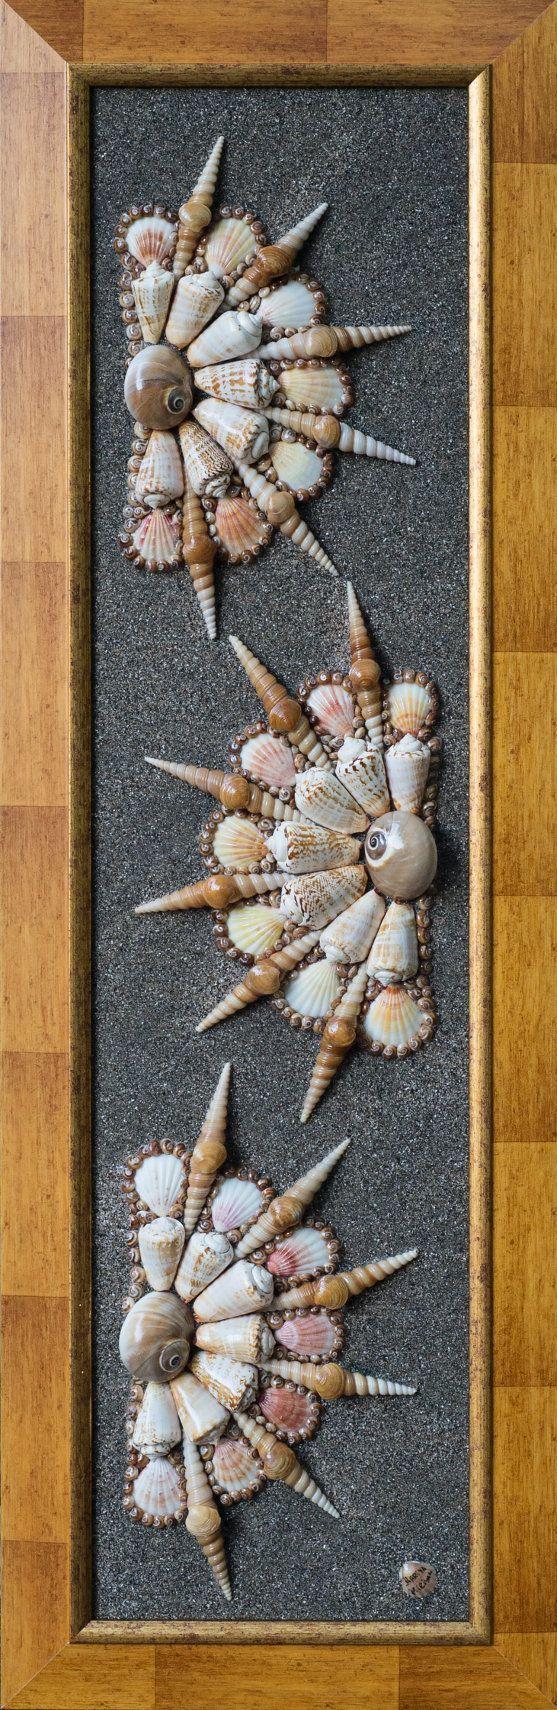 Medios mixtos de conchas de mar arte, mosaico arte moderno Original, regalo…